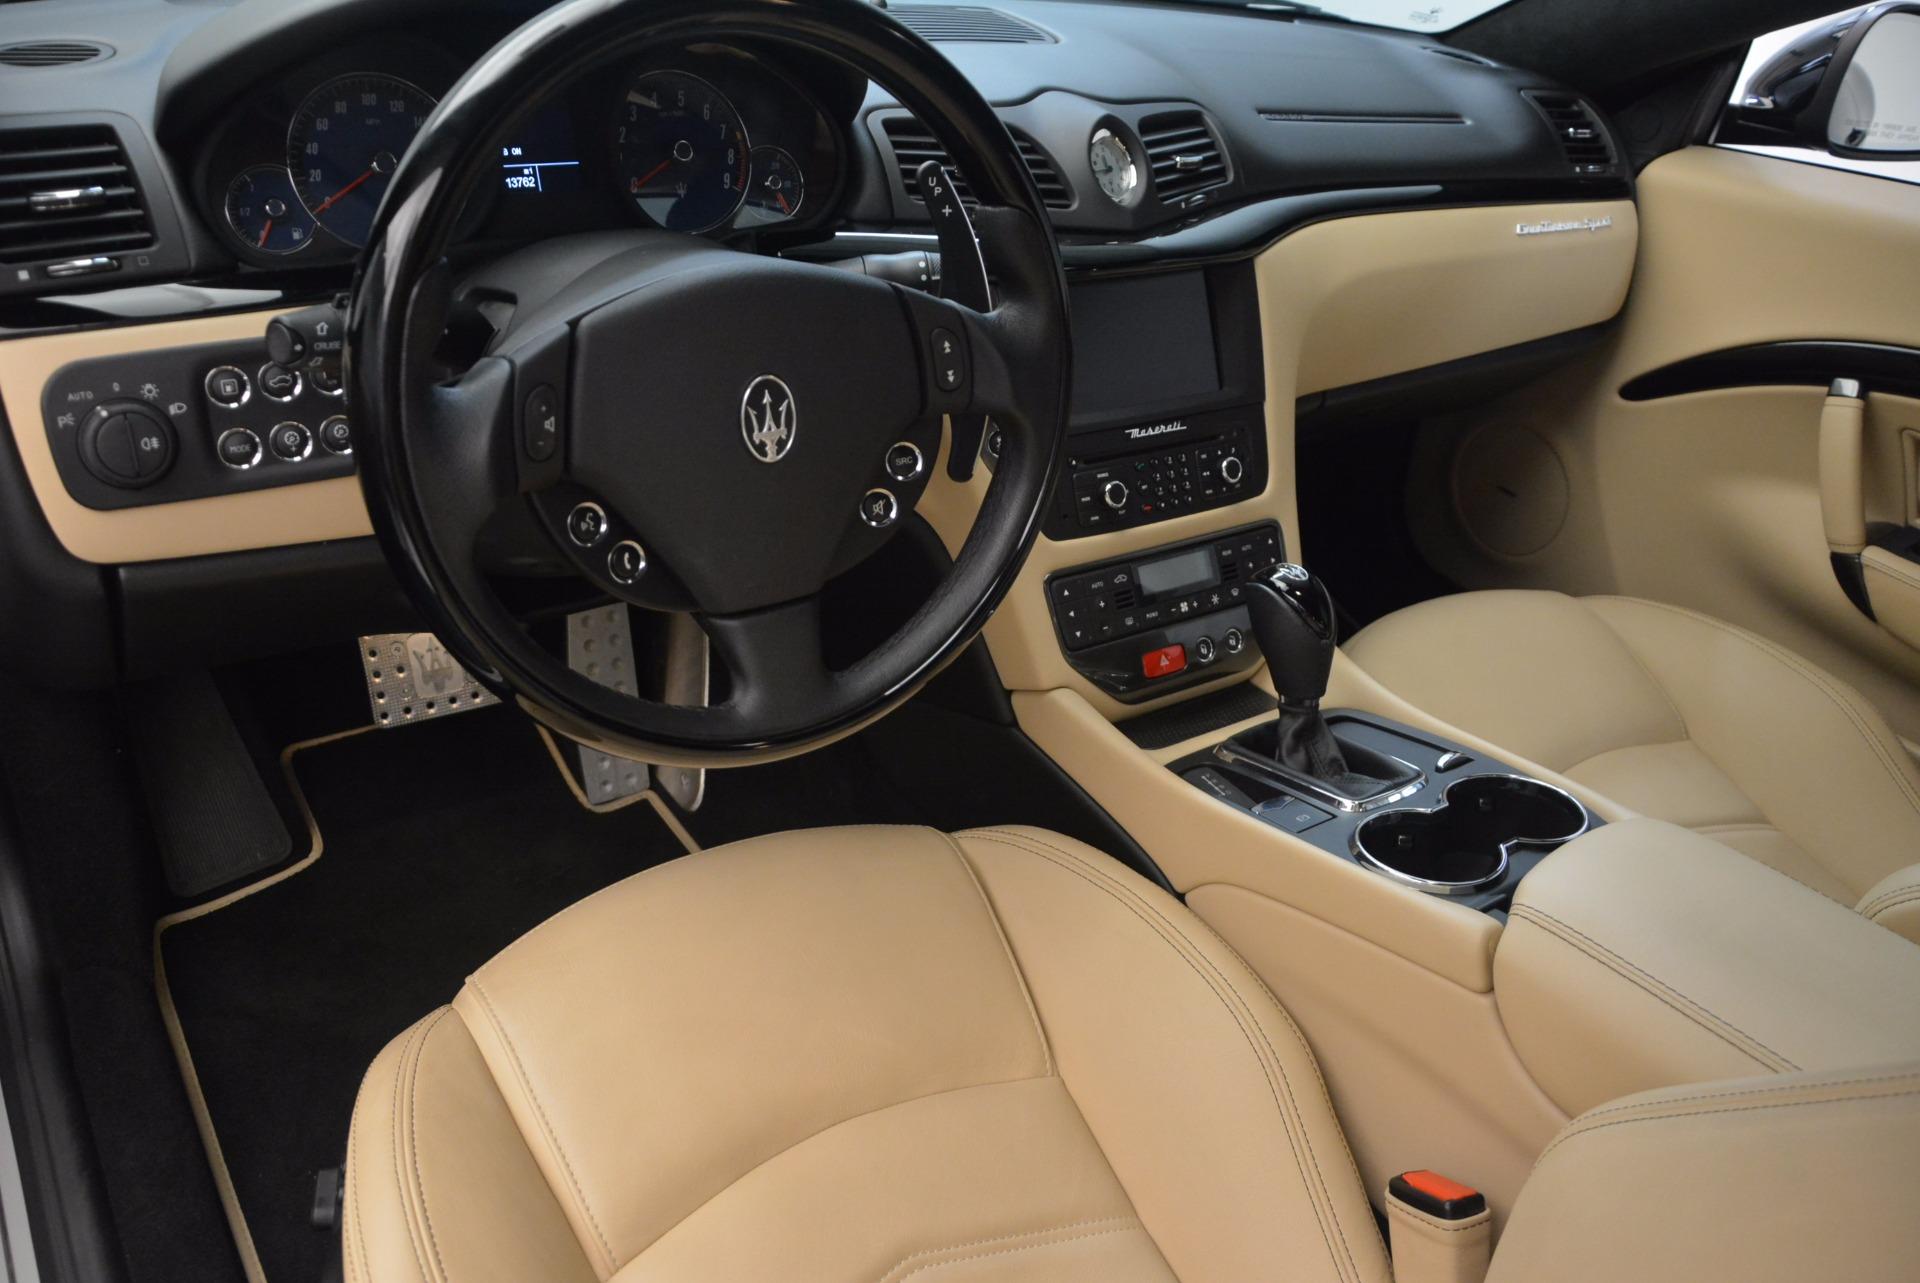 Used 2015 Maserati GranTurismo Sport Coupe For Sale In Westport, CT 1557_p13